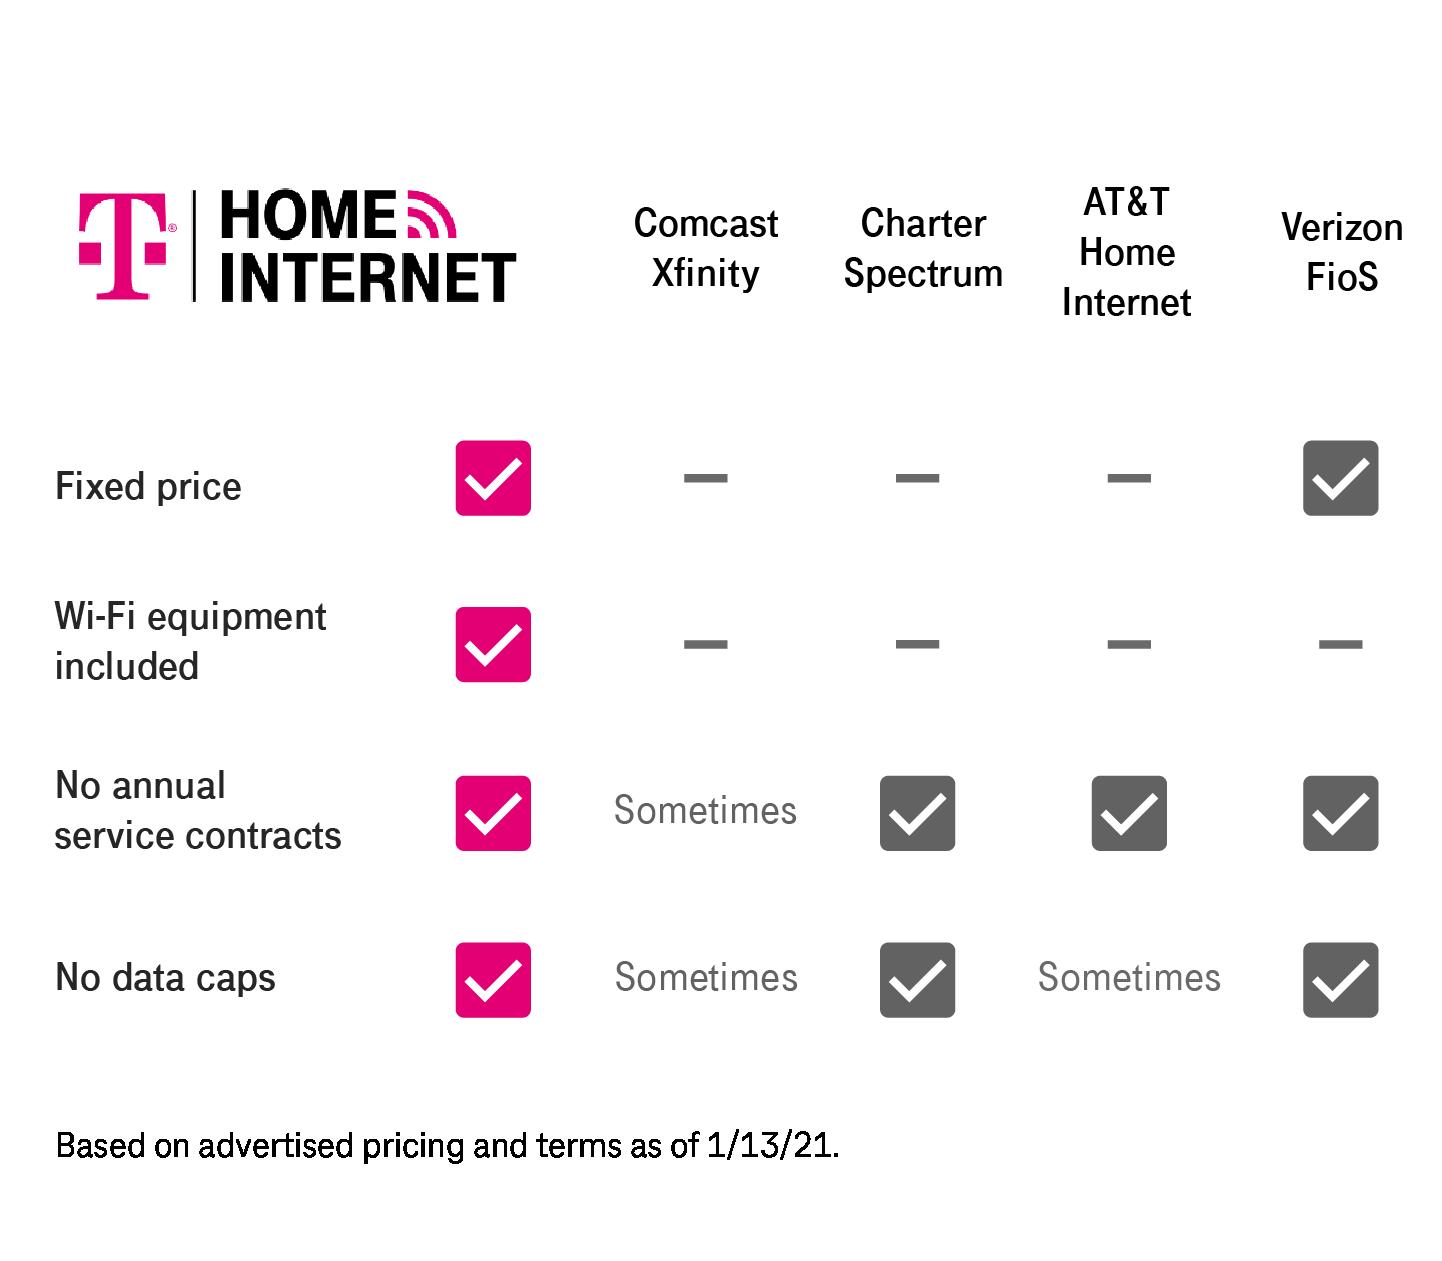 T-Mobile Home Internet comparison chart